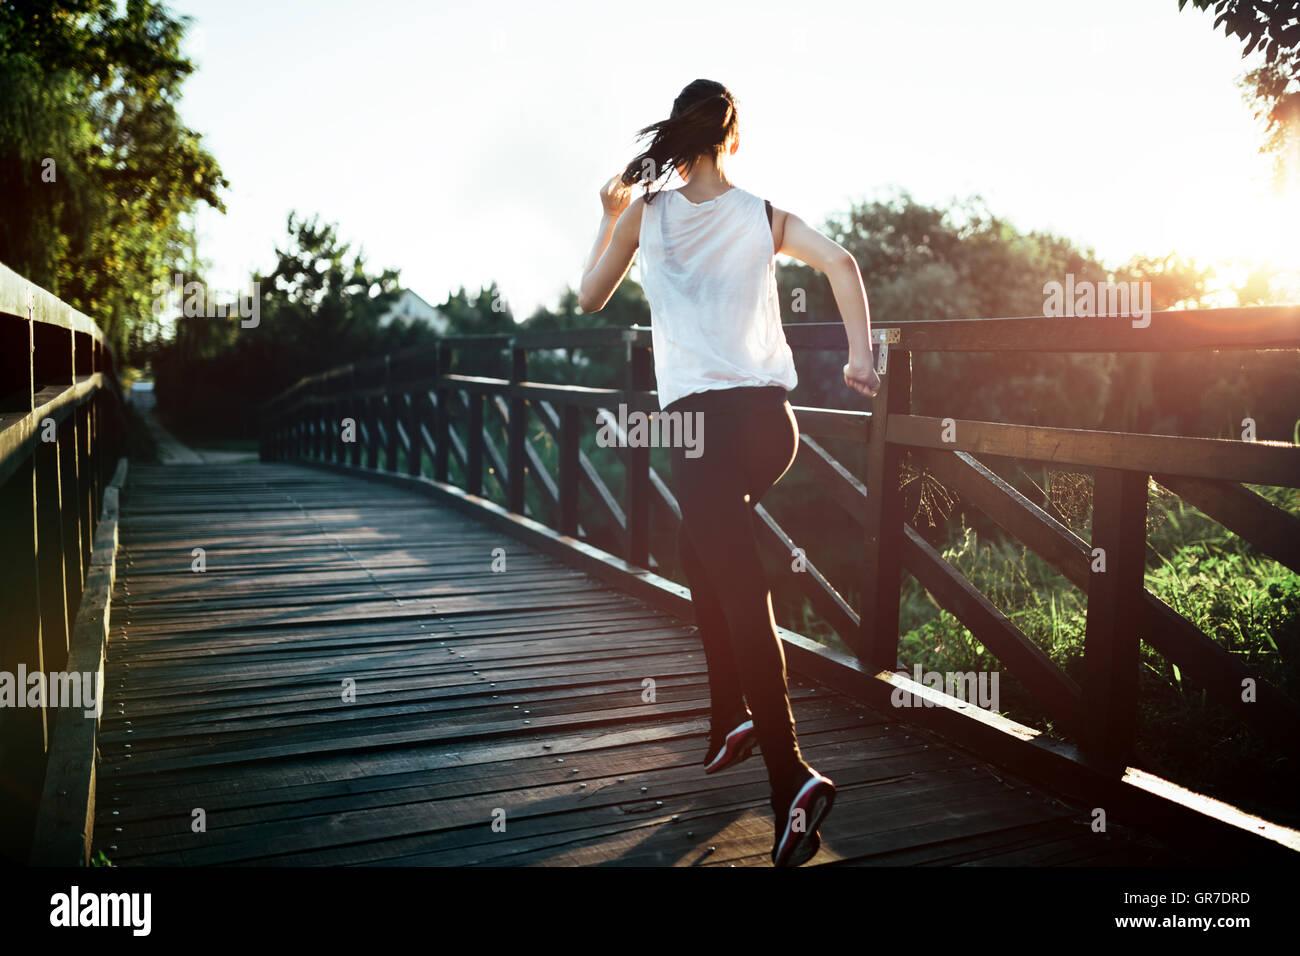 Schöne sportliche Jogger Kreuzung Brücke Stockbild